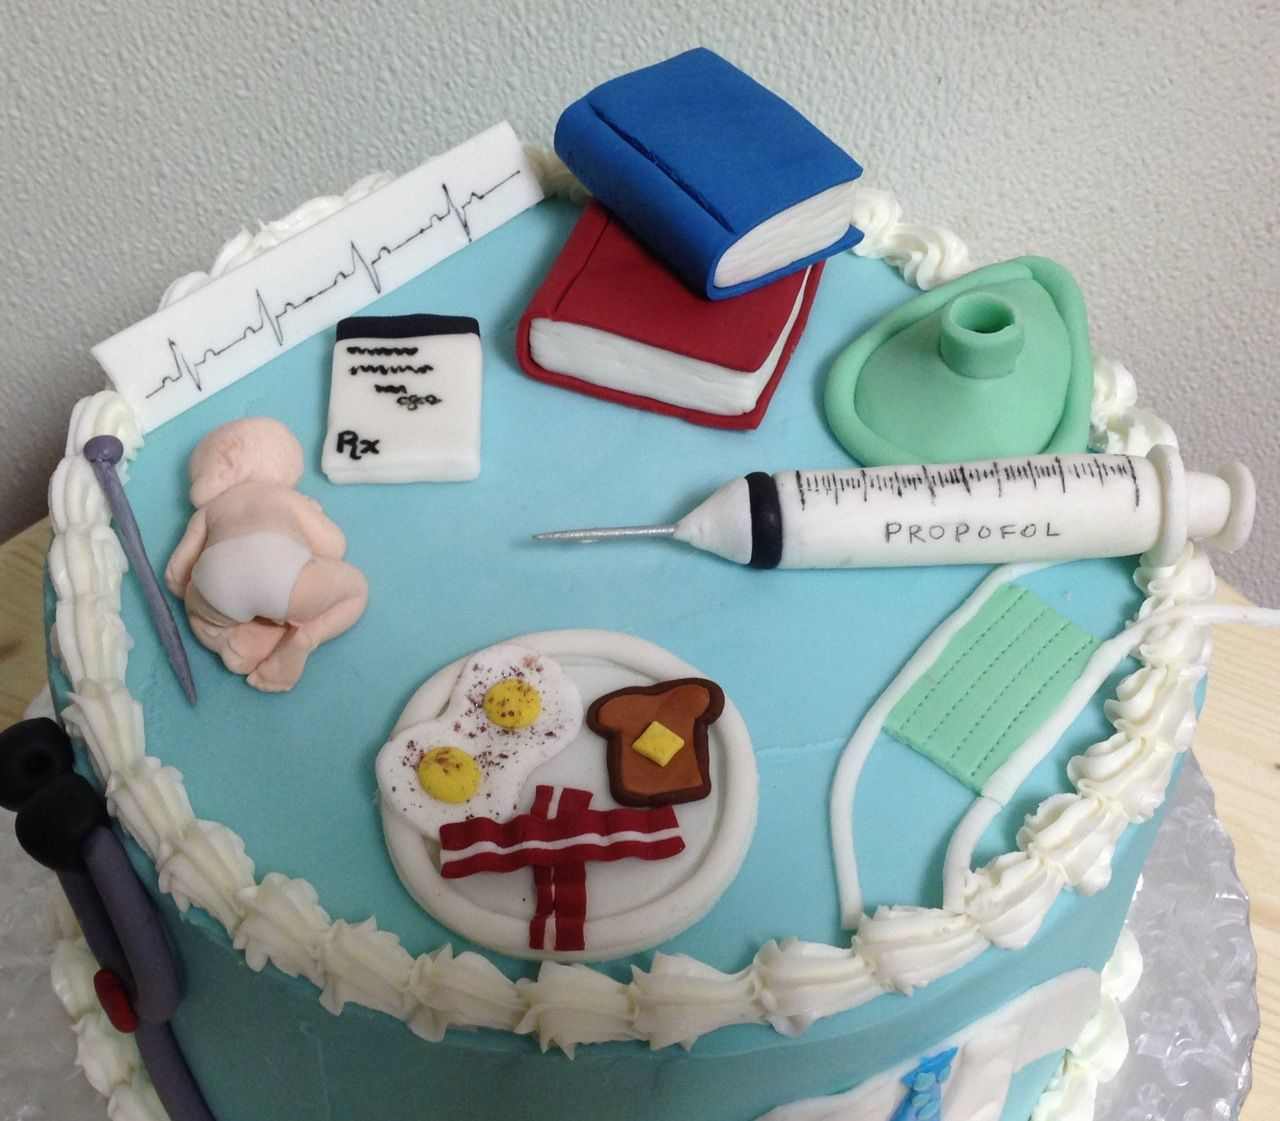 Anesthesia Retirement cake